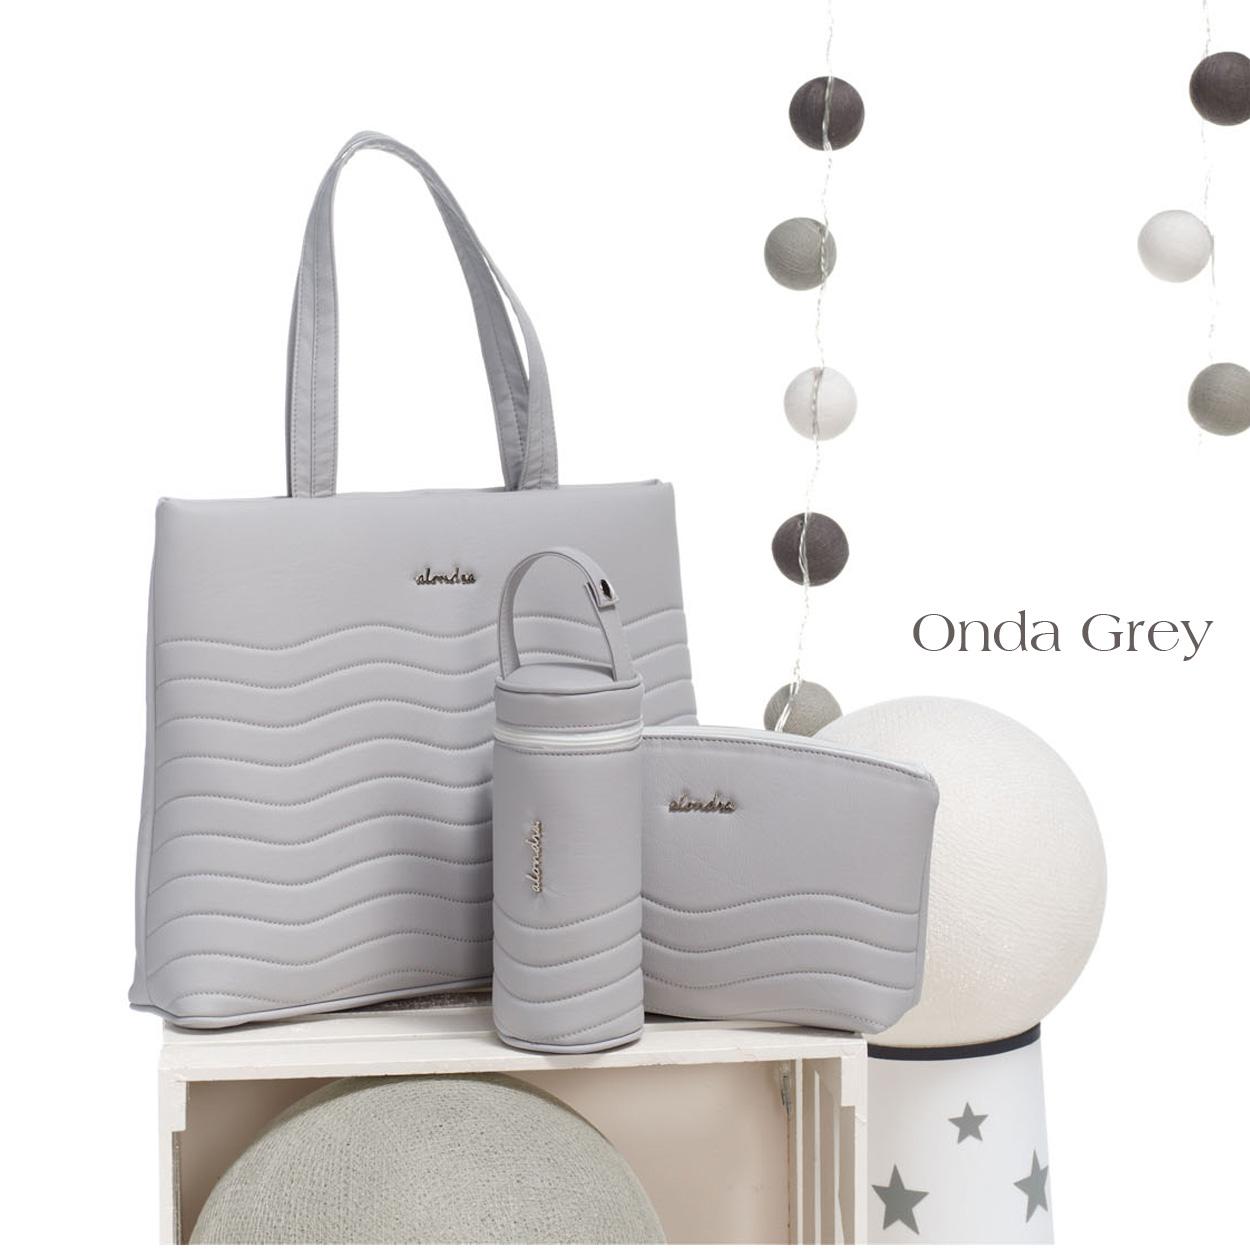 bolsos-onda-grey-alondra